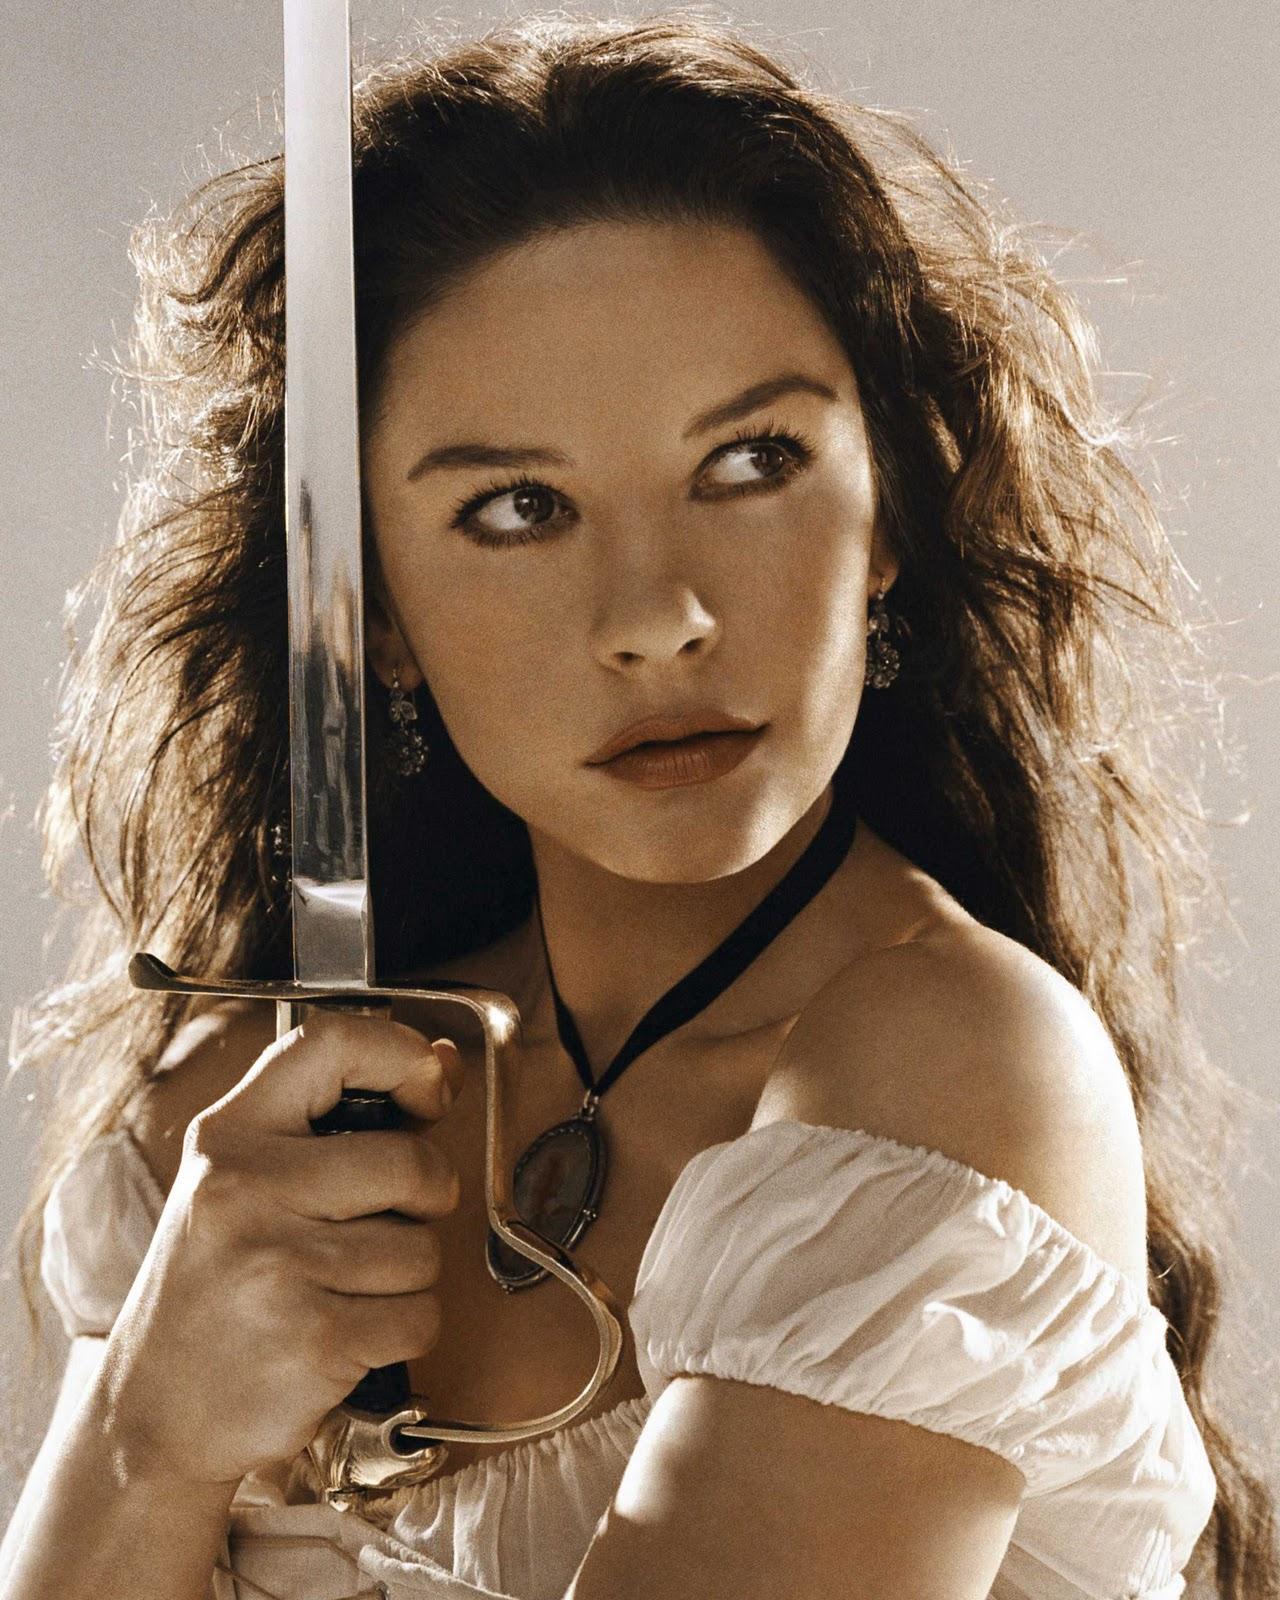 Celebrities, Movies and Games: Catherine Zeta-Jones - The ...